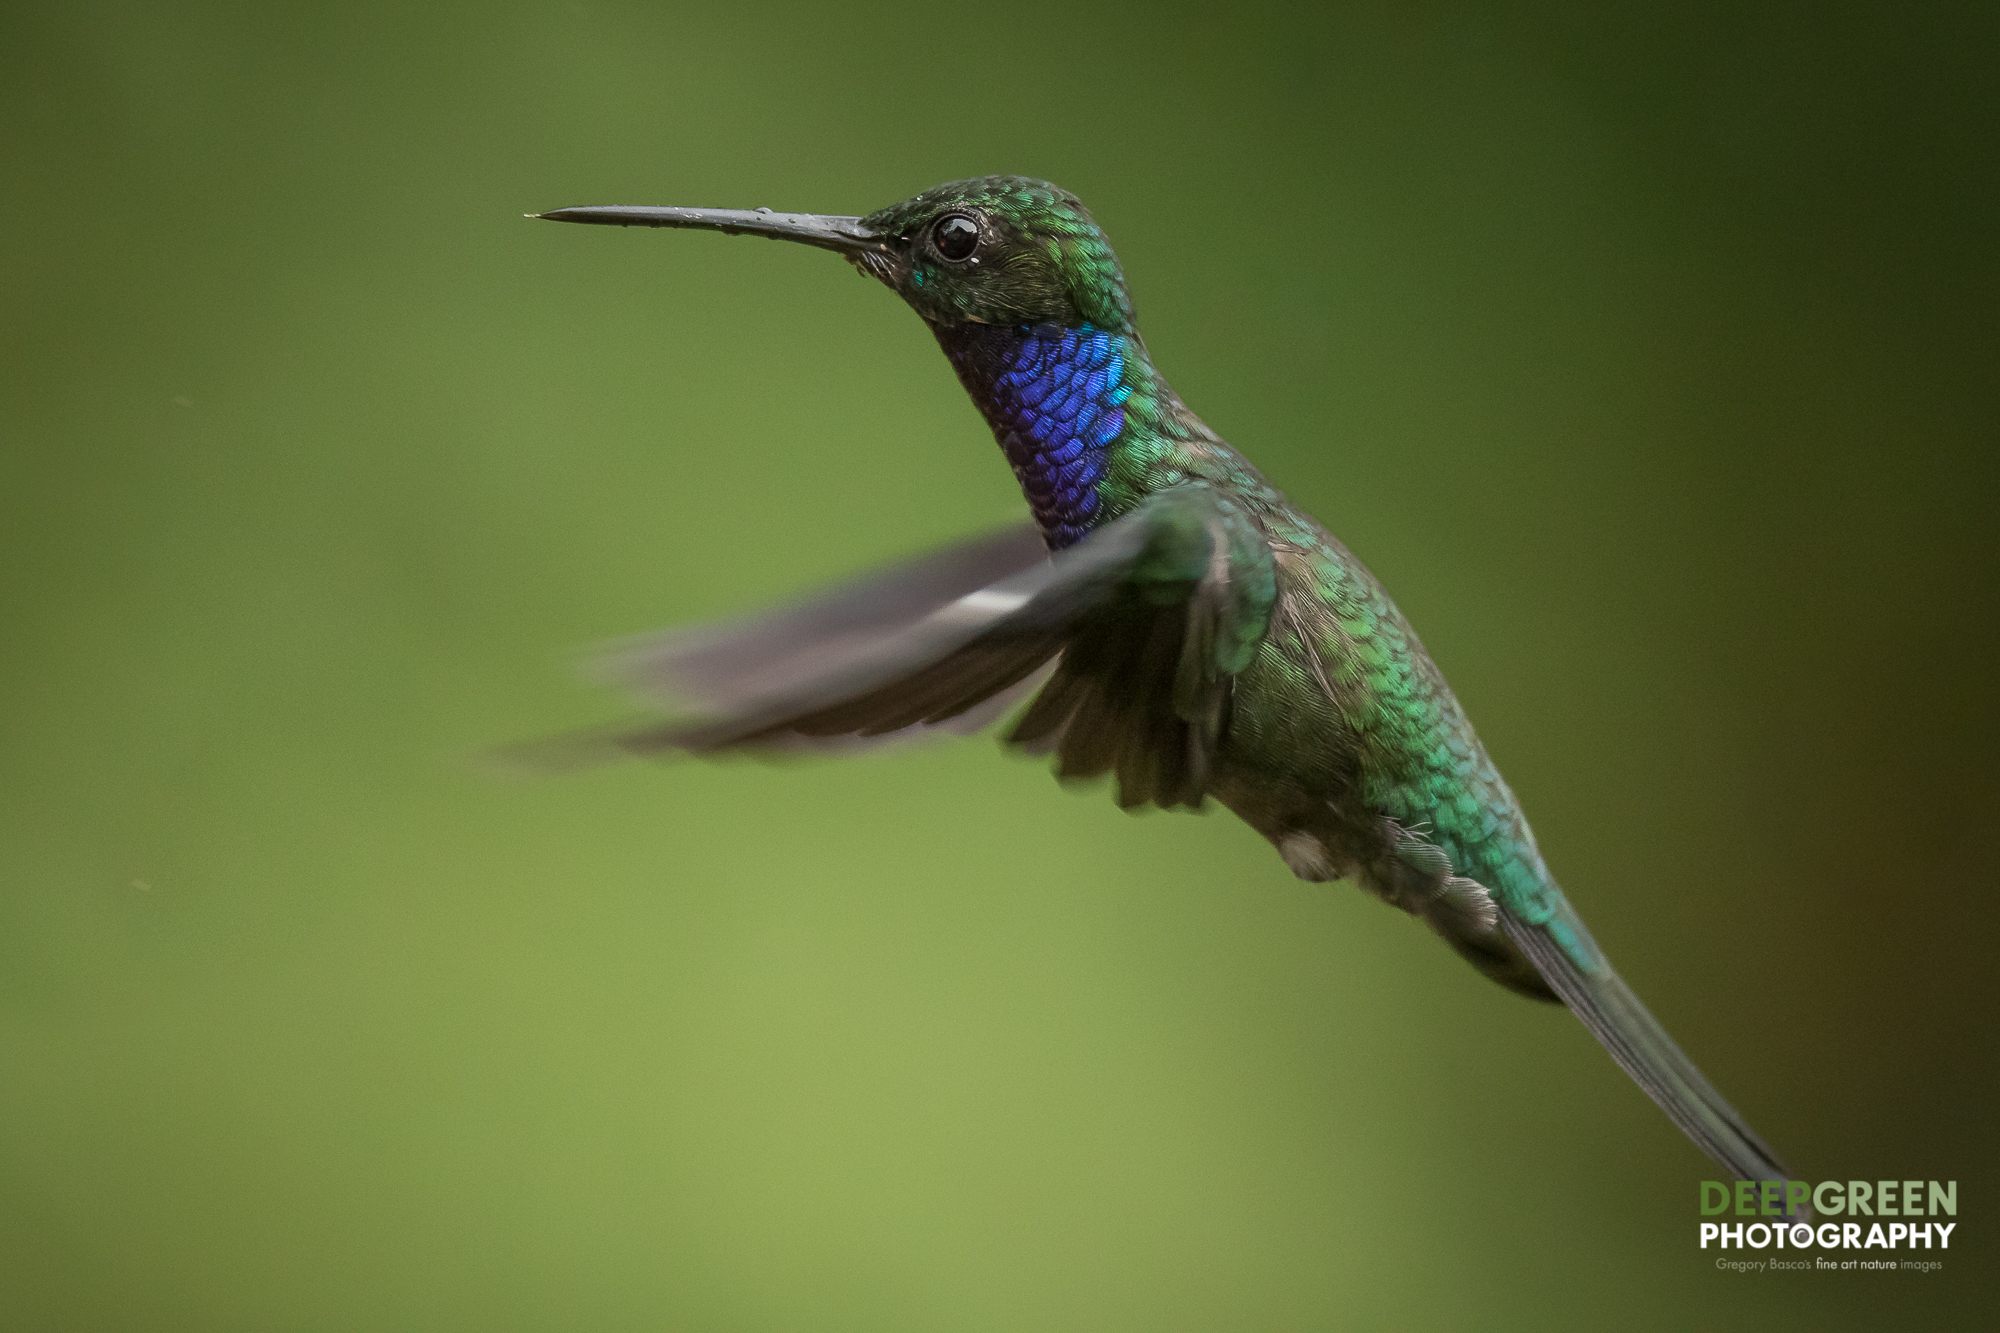 DGP-stock-hummingbirds-134.jpg